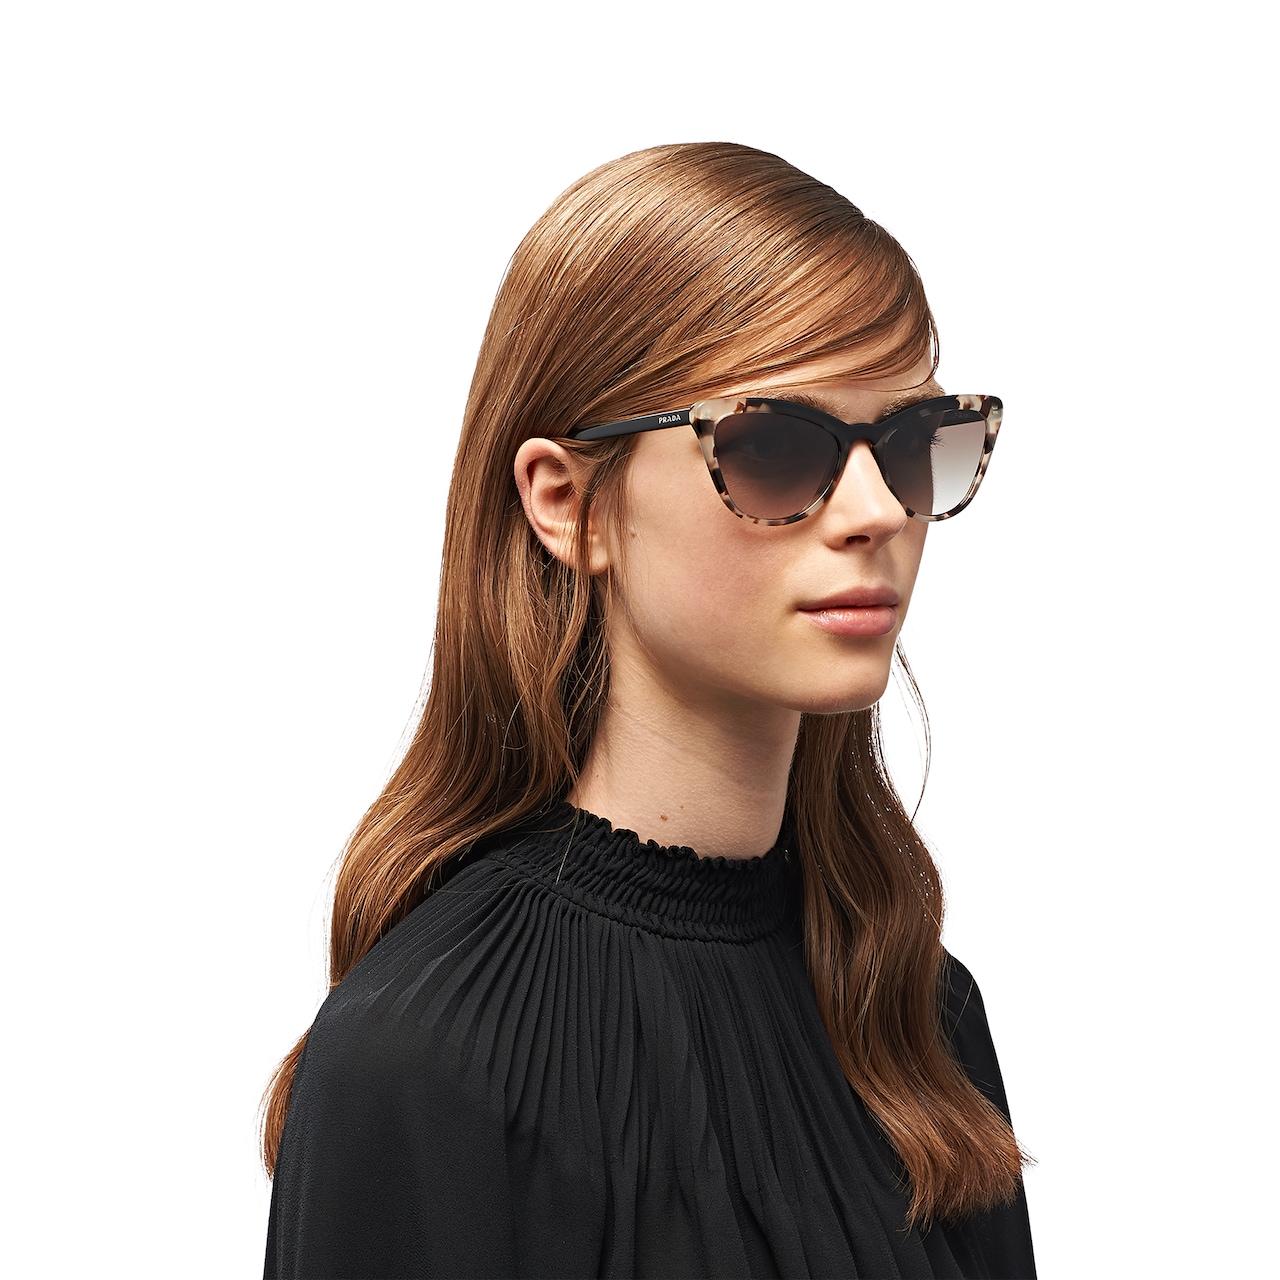 Prada Ultravox sunglasses Alternative fit